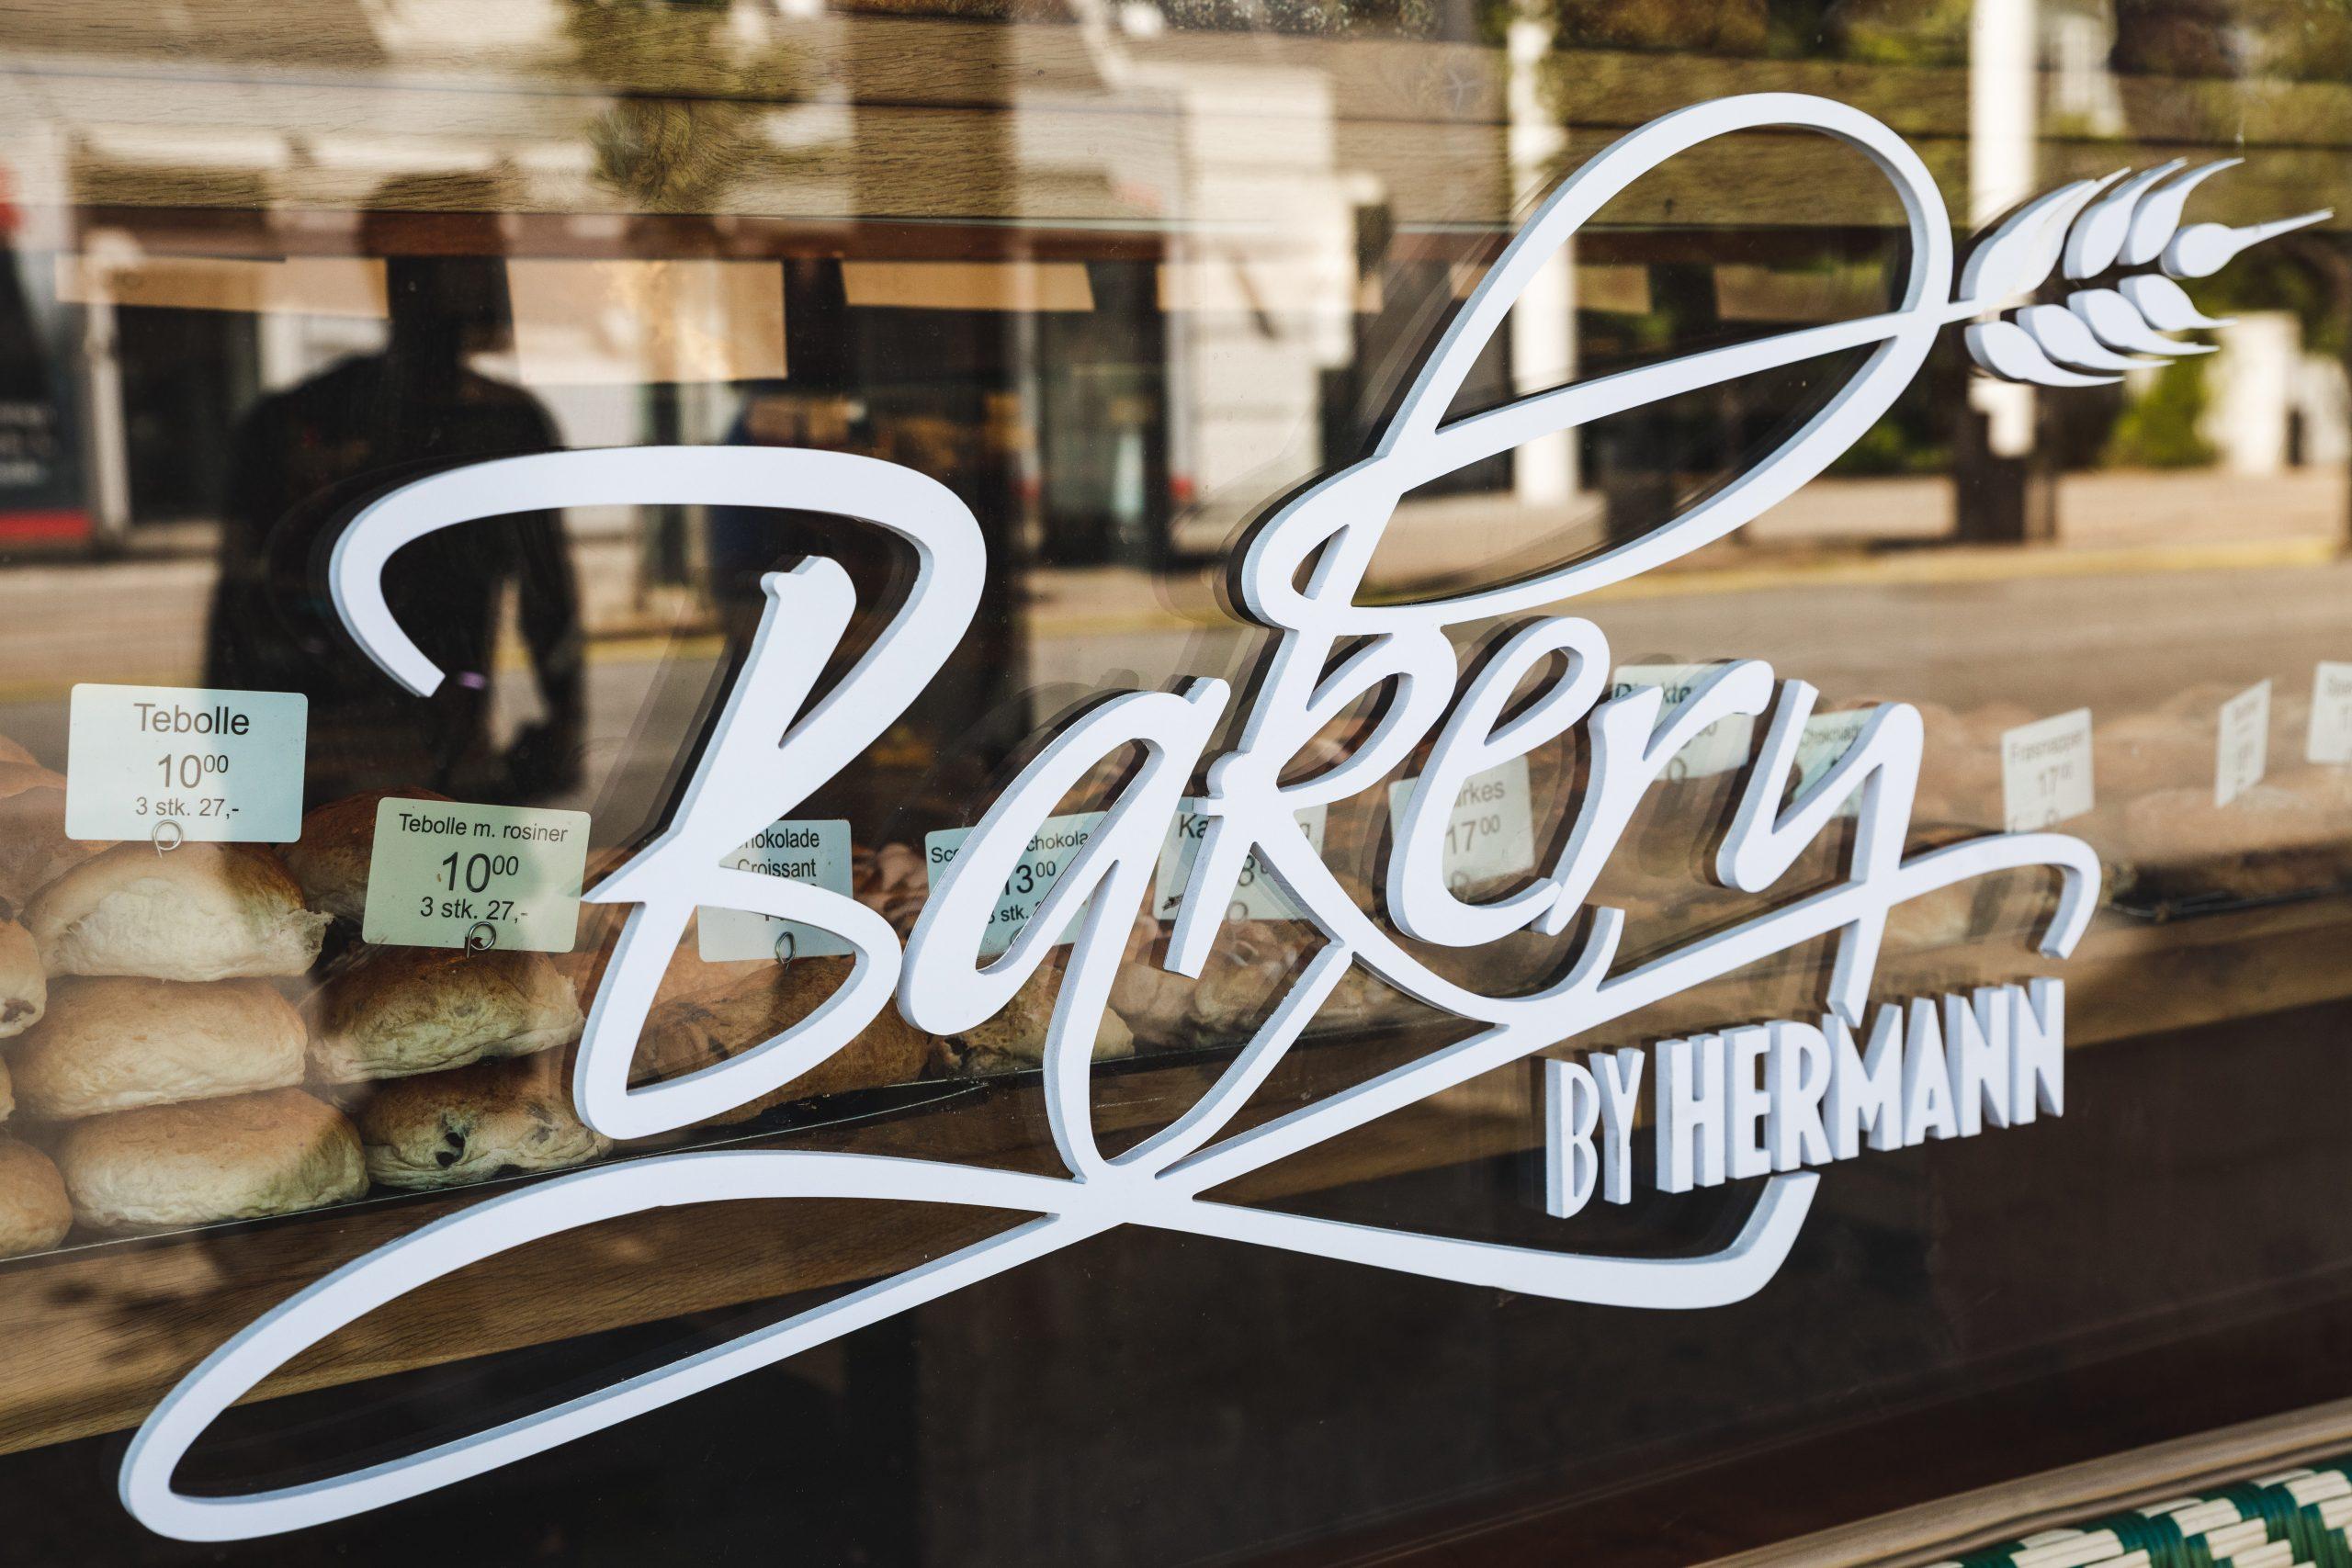 Bakery BY Herman - Forretning